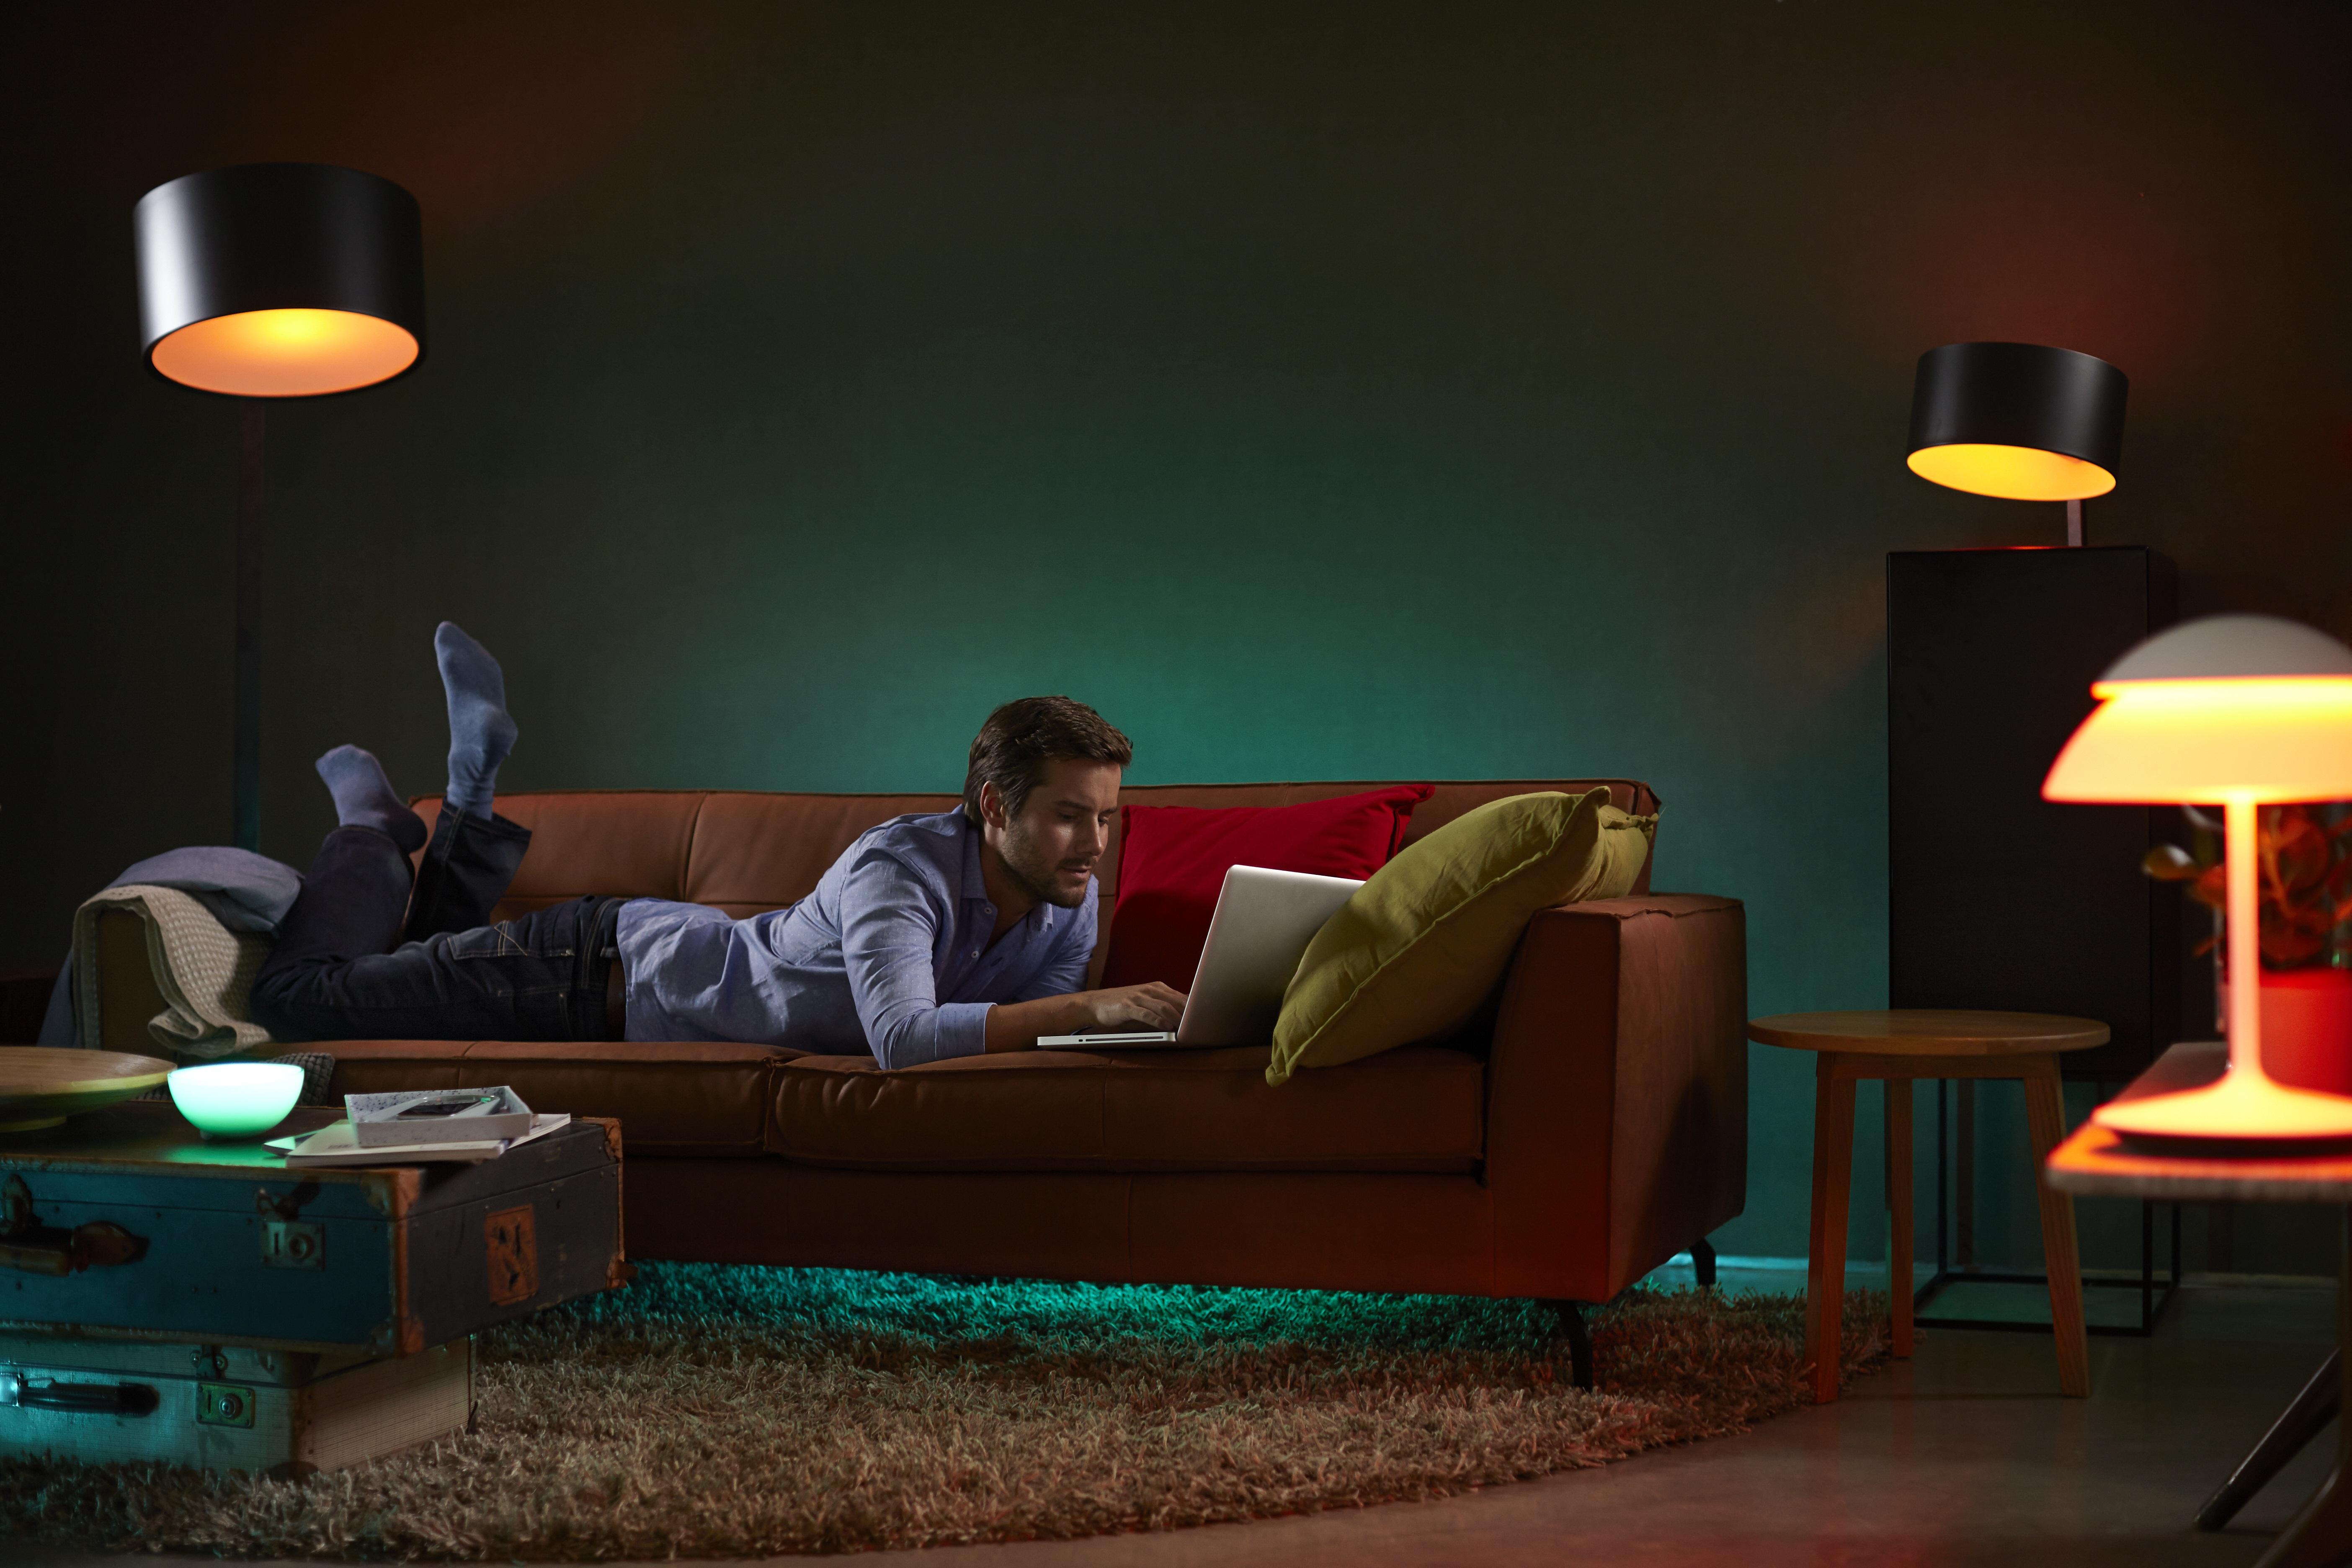 Philips Hue color smart light bulbs.